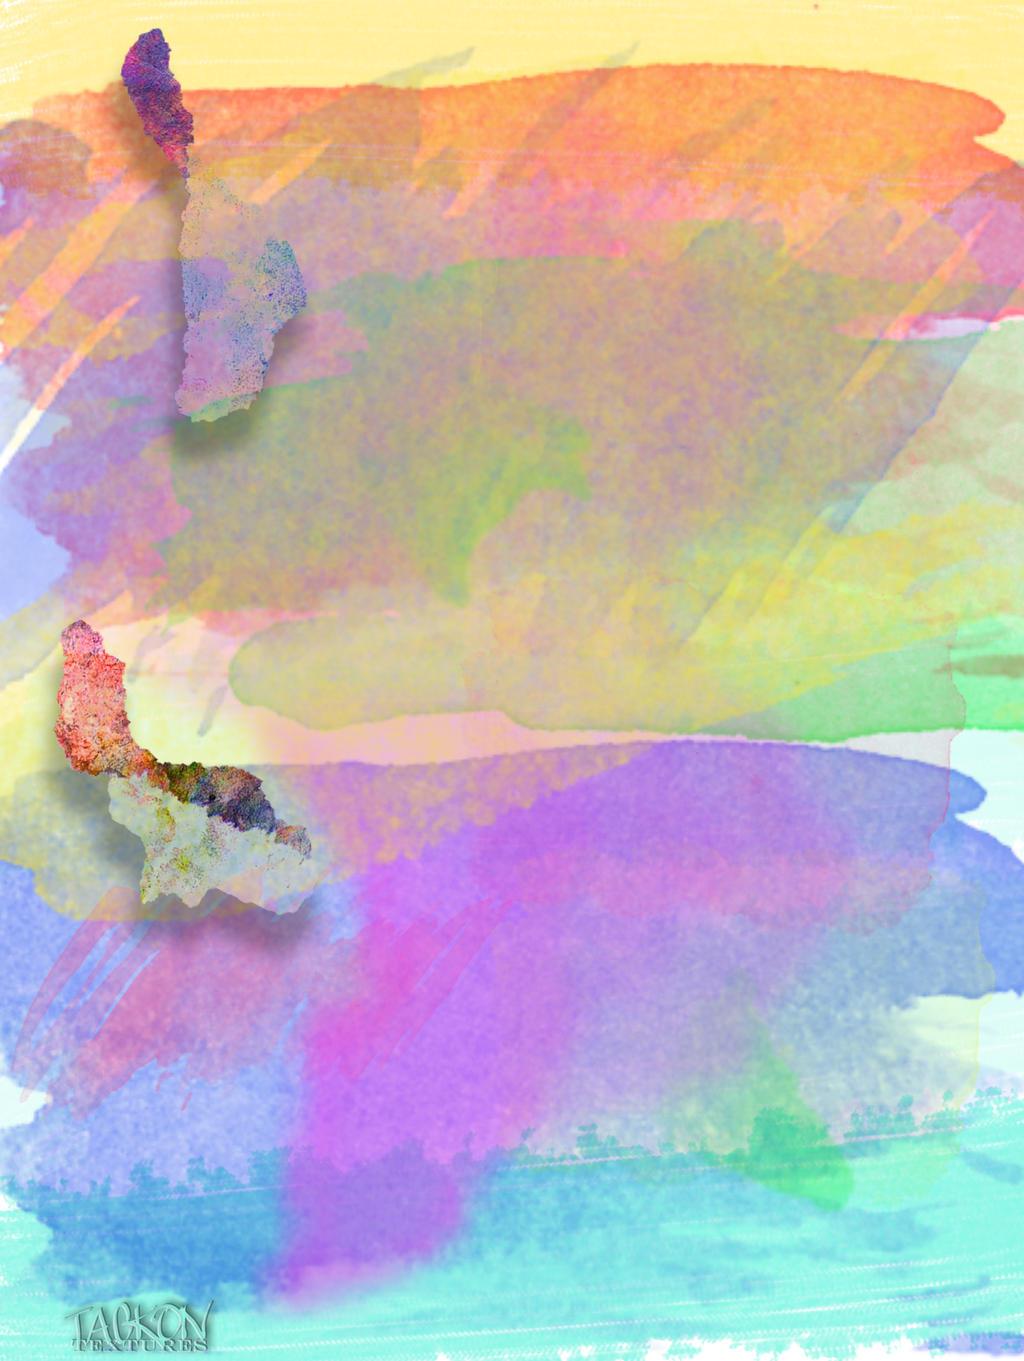 Watercolour Texture 03 by Tackon